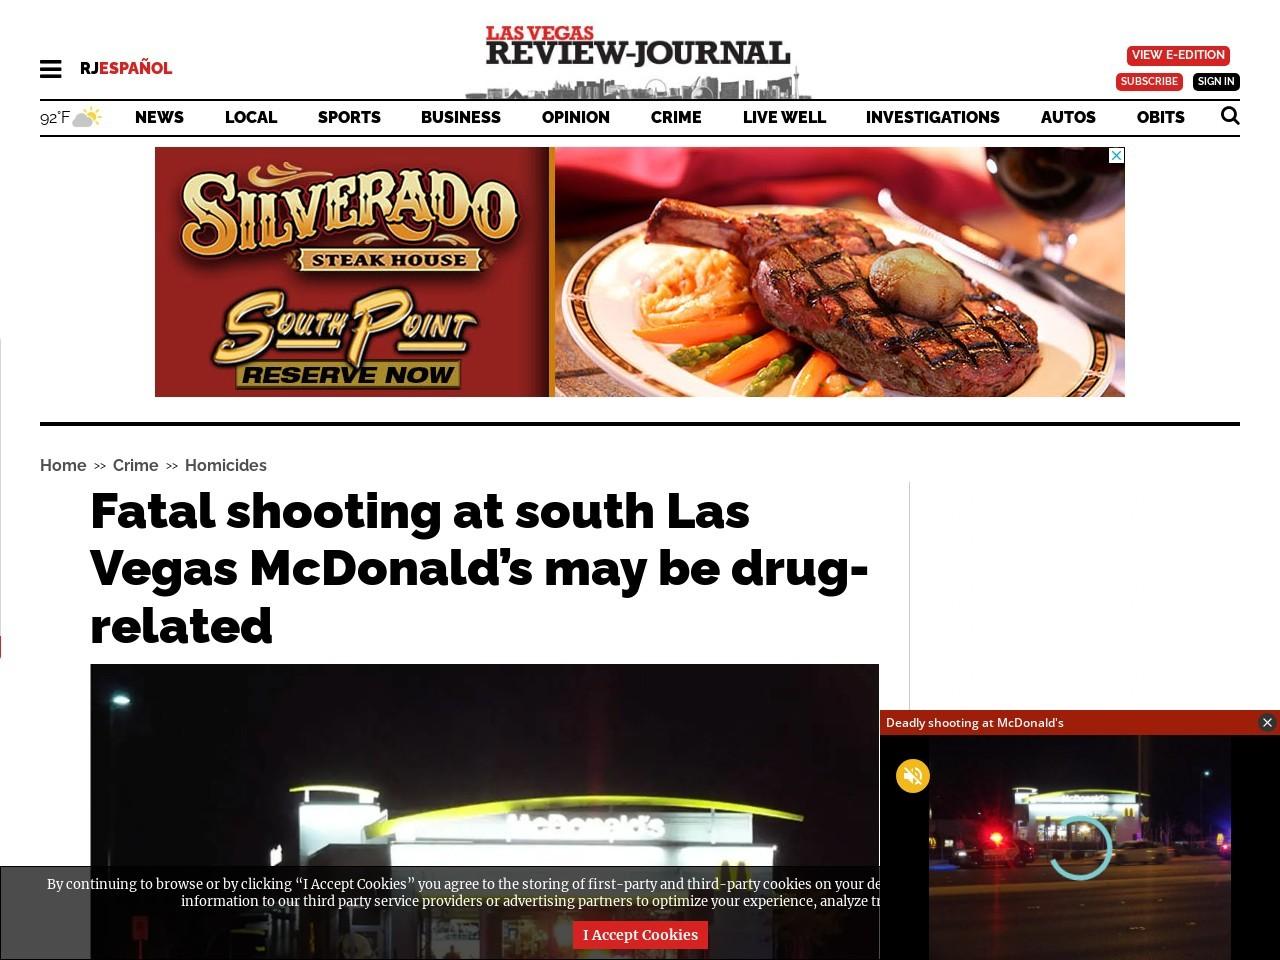 Fatal shooting at south Las Vegas McDonald's may be drug-related